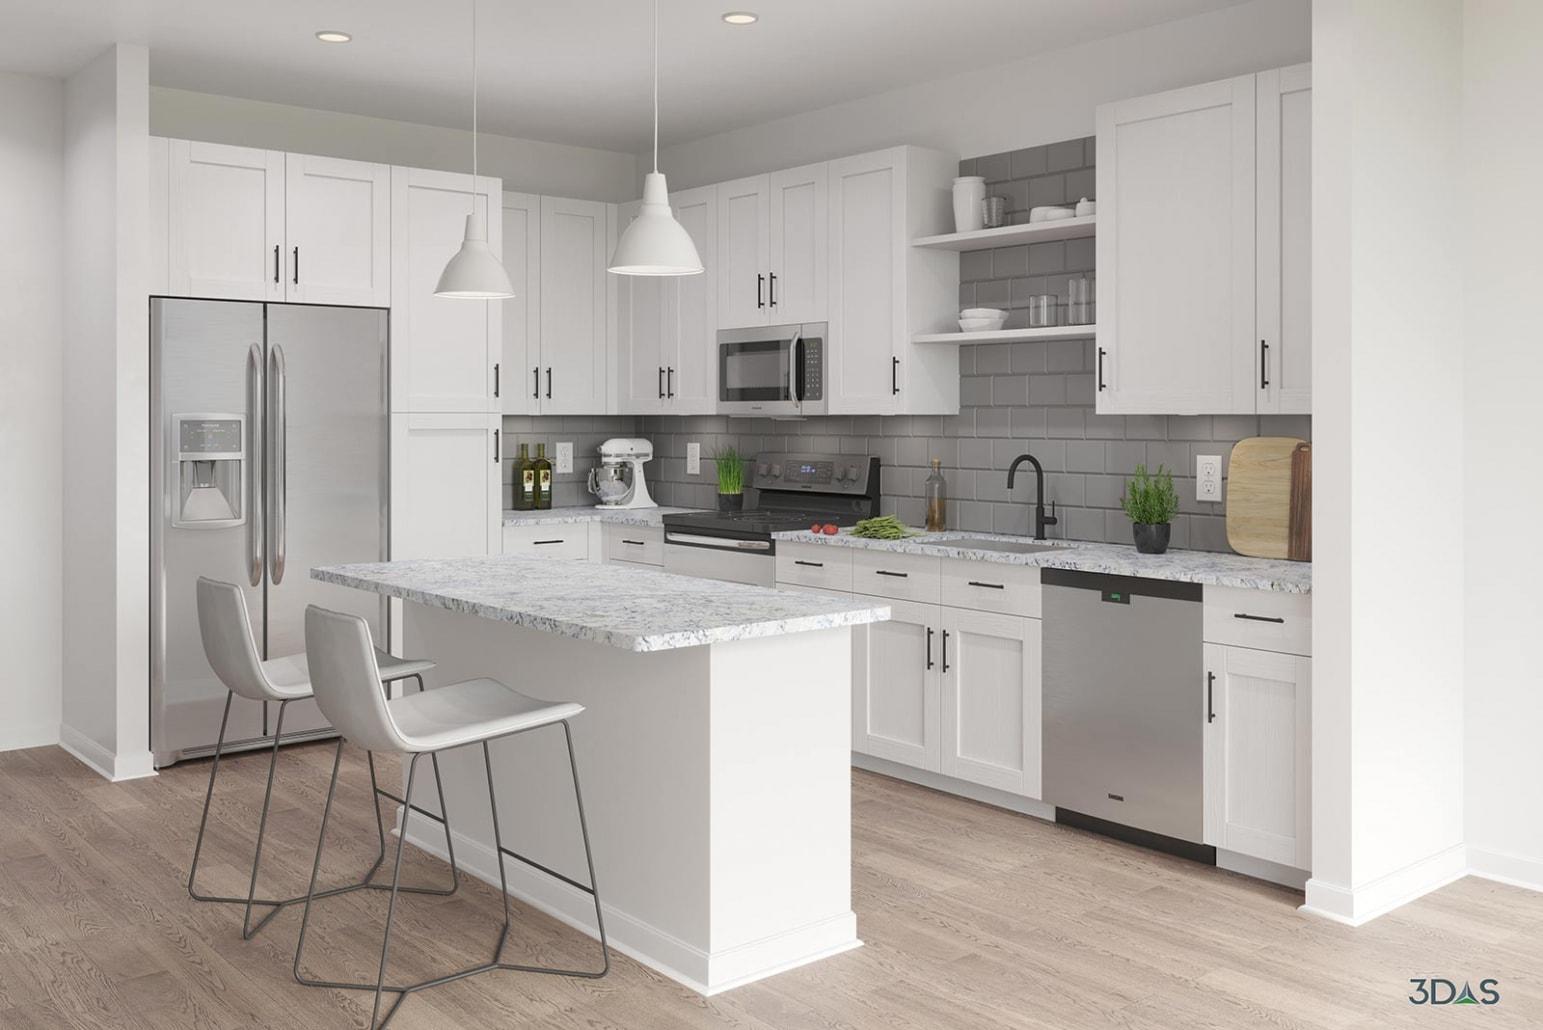 Majorca Kitchen Alternate Finishes 3D Rendering Interior by 3DAS